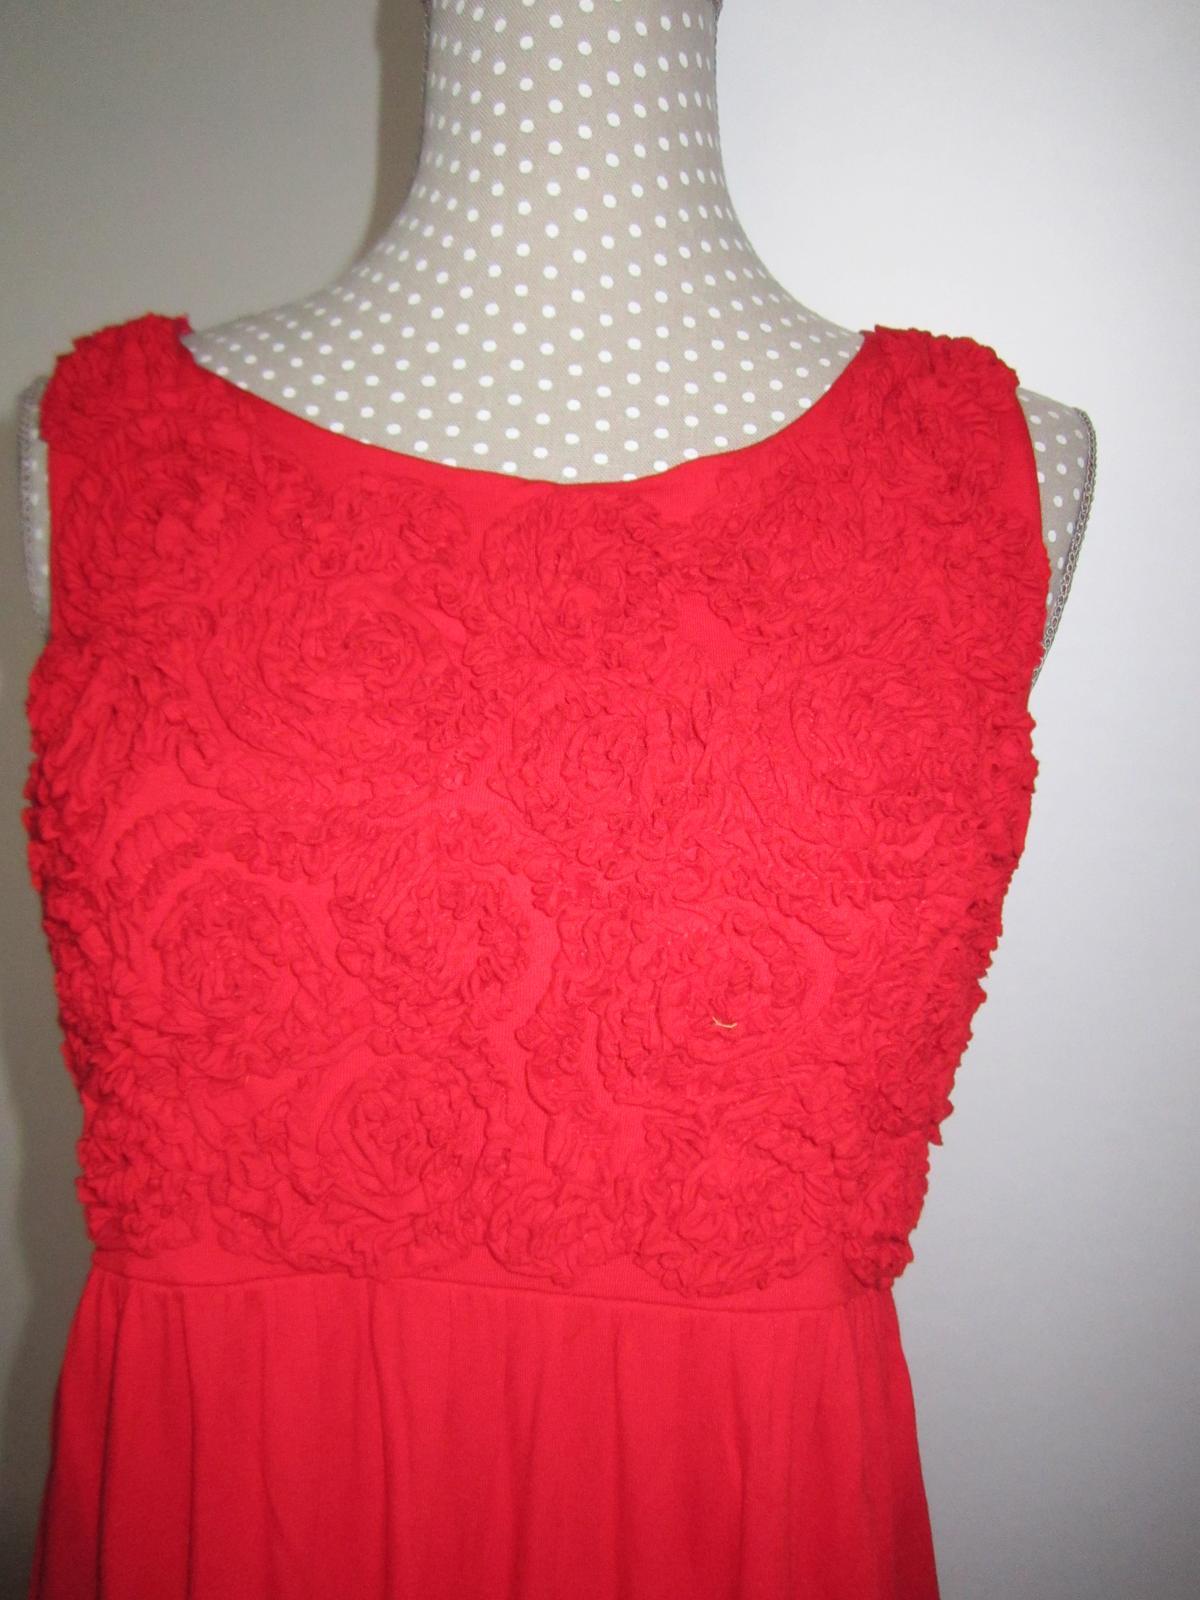 1672. Dorothy Perkins šaty - Obrázok č. 1